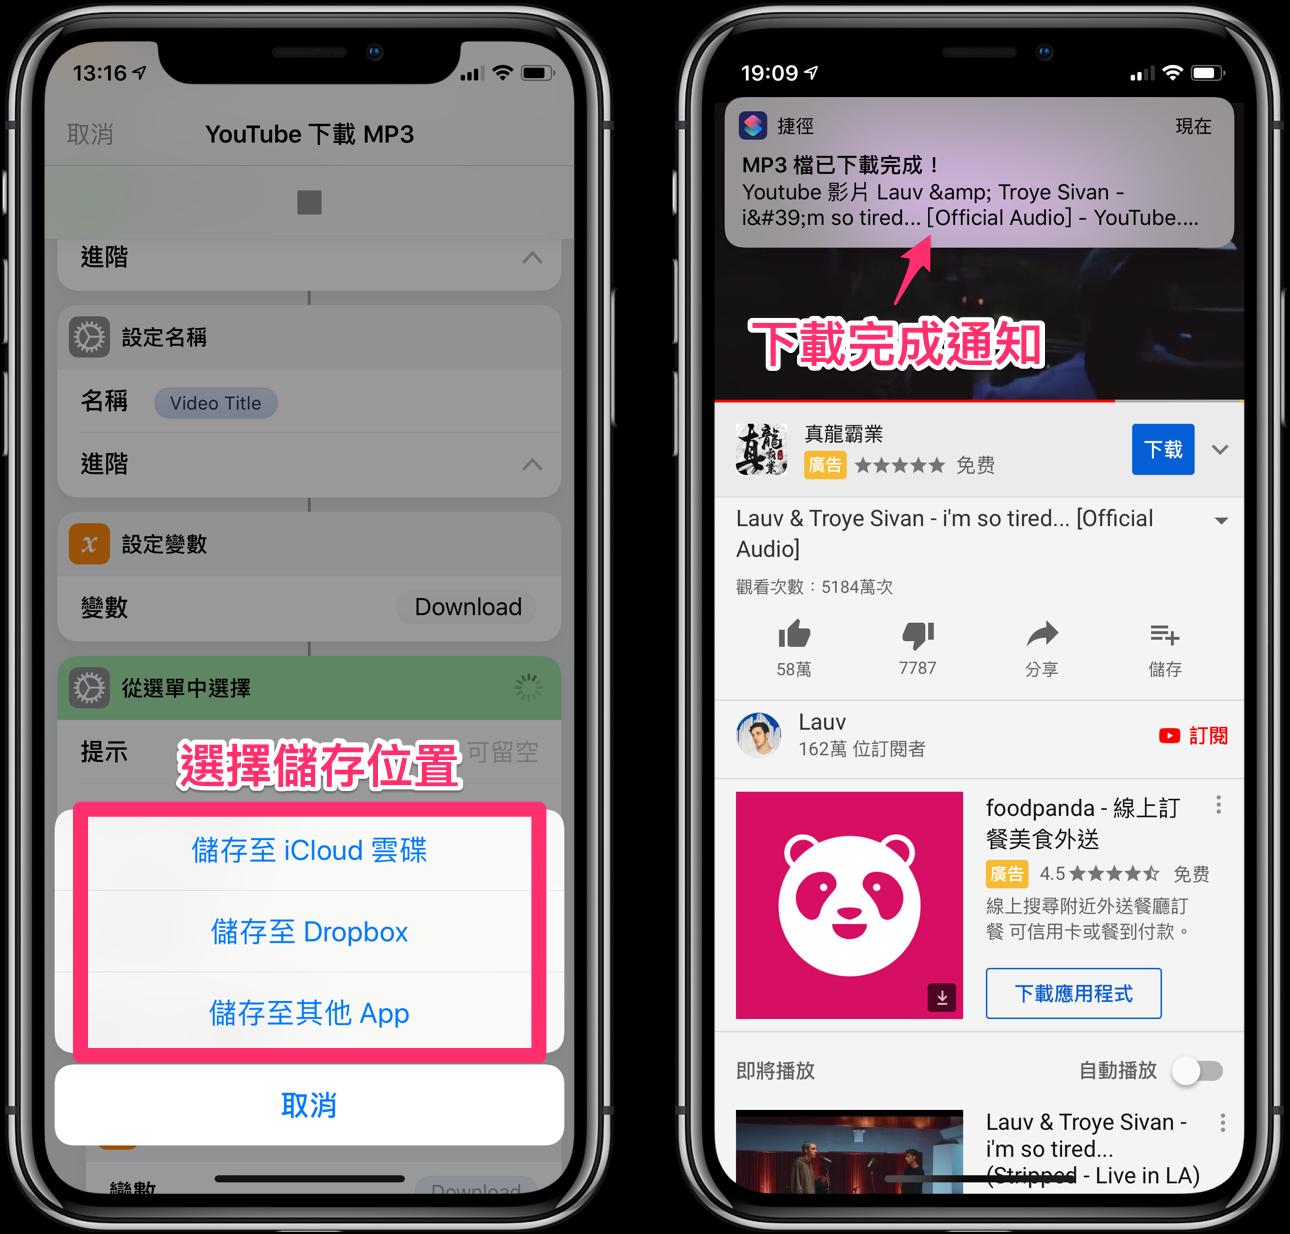 用《捷徑》iPhone 簡單完成YouTube 下載MP3 – APPLEFANS 蘋果迷